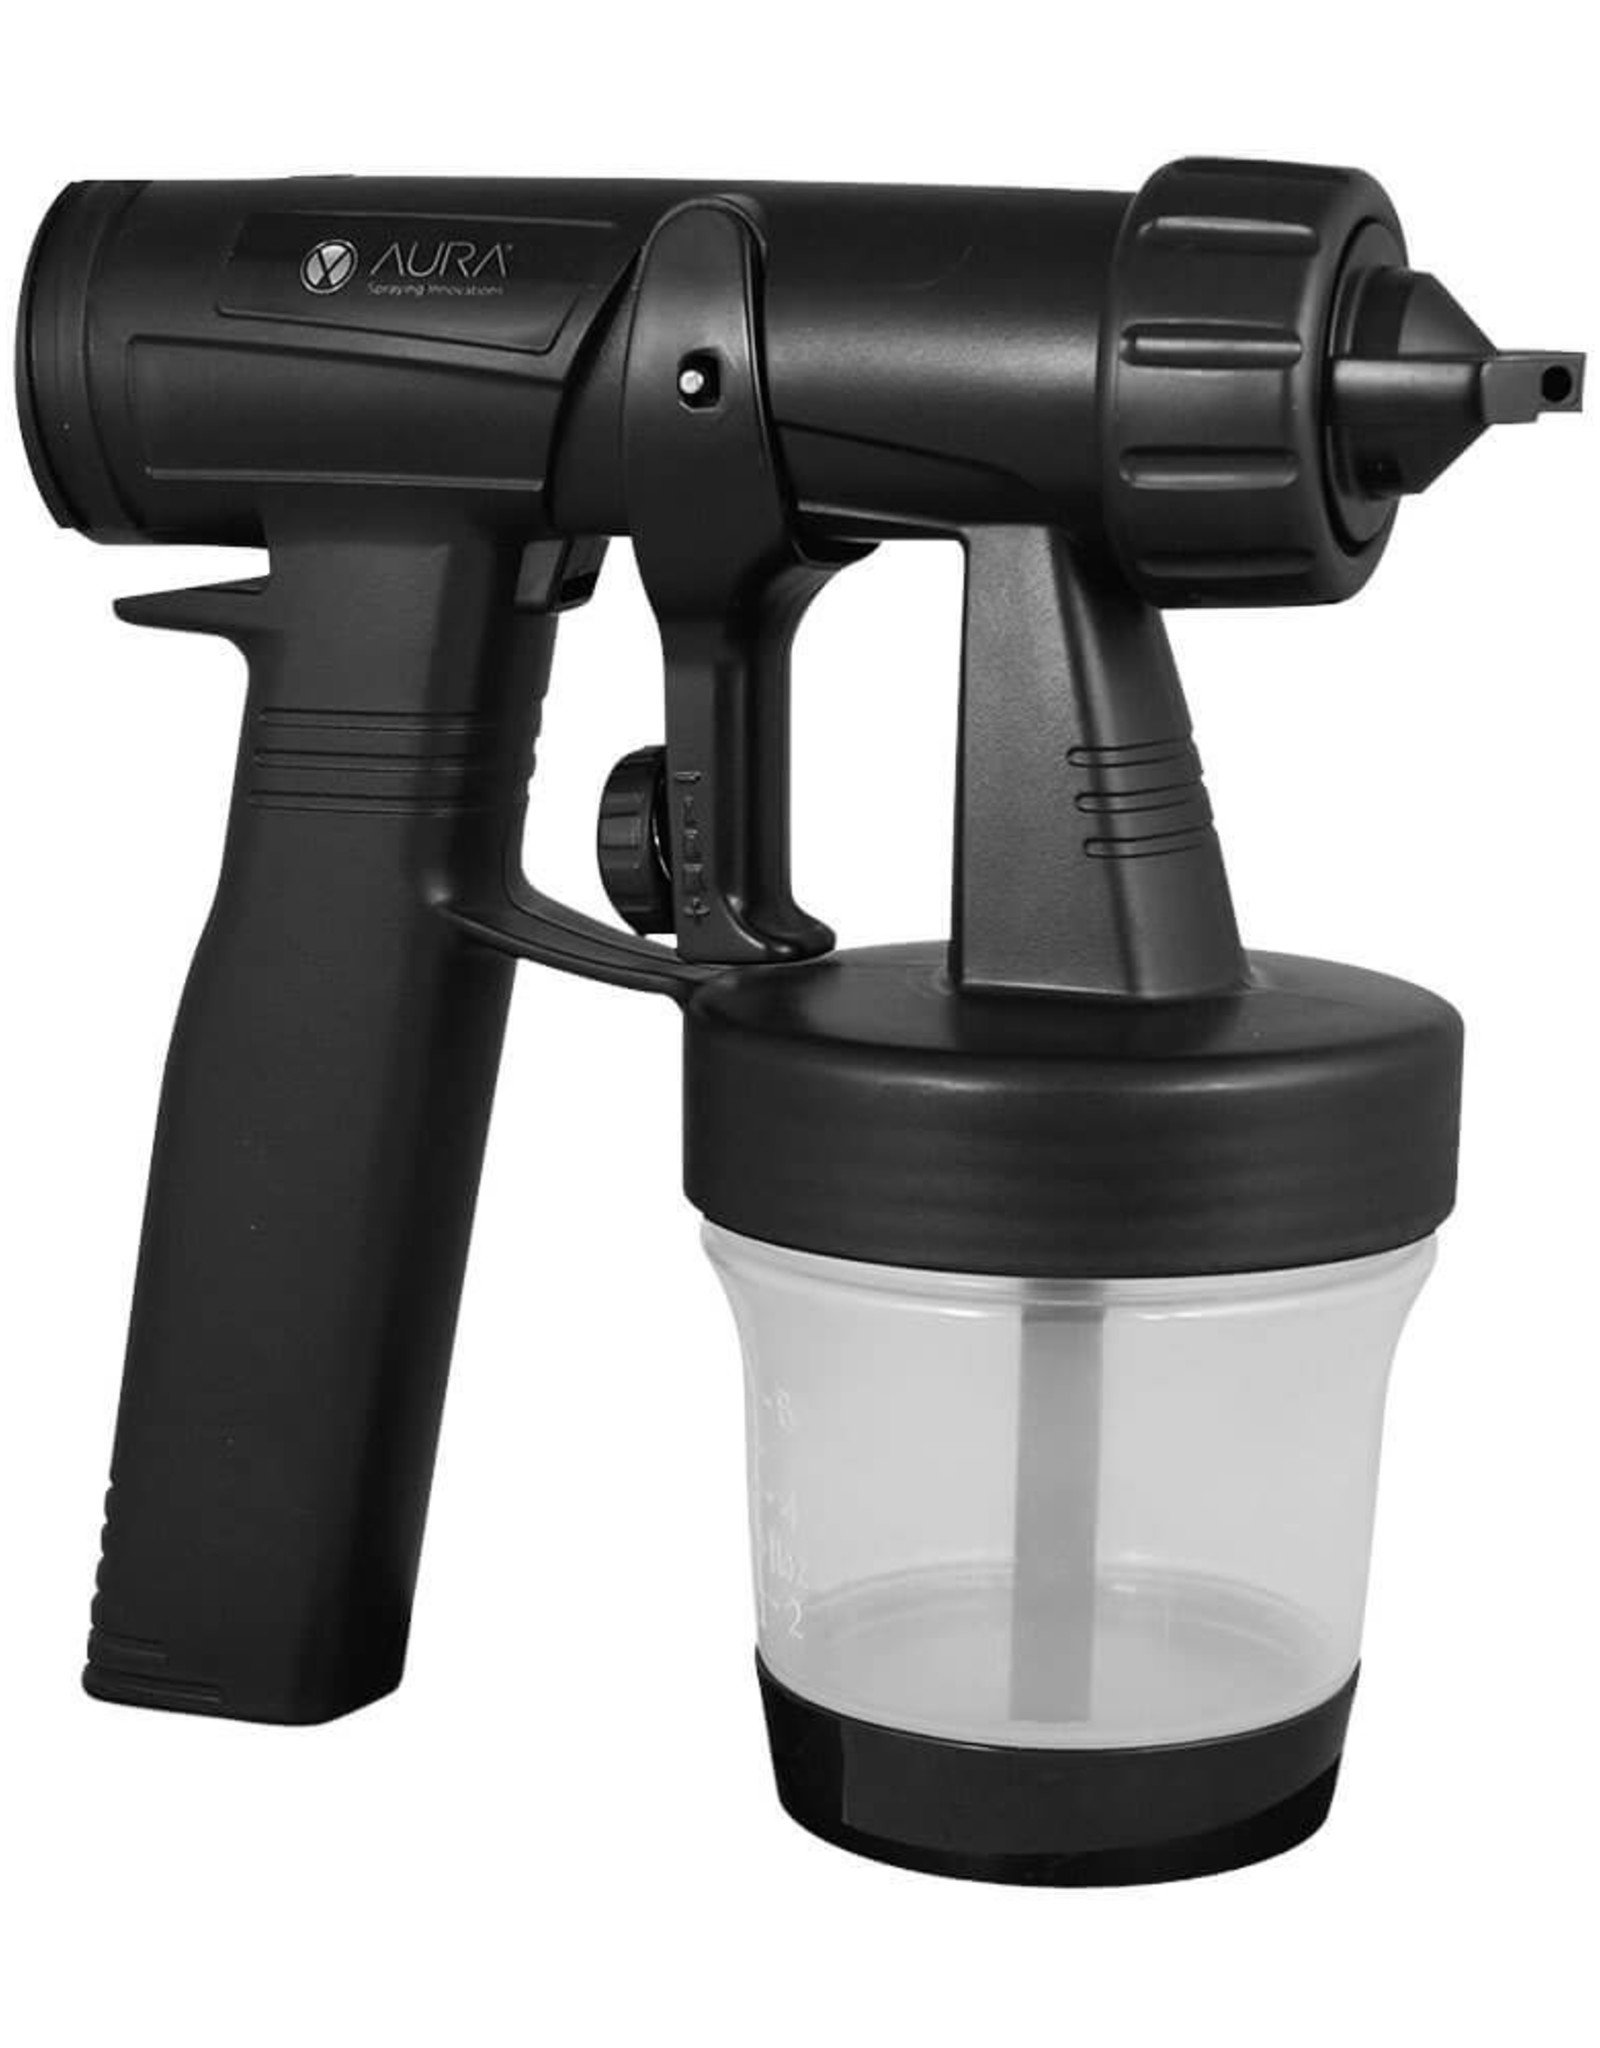 Aura Aura Allure  Spray Tan applicator met bijgevoegde beker